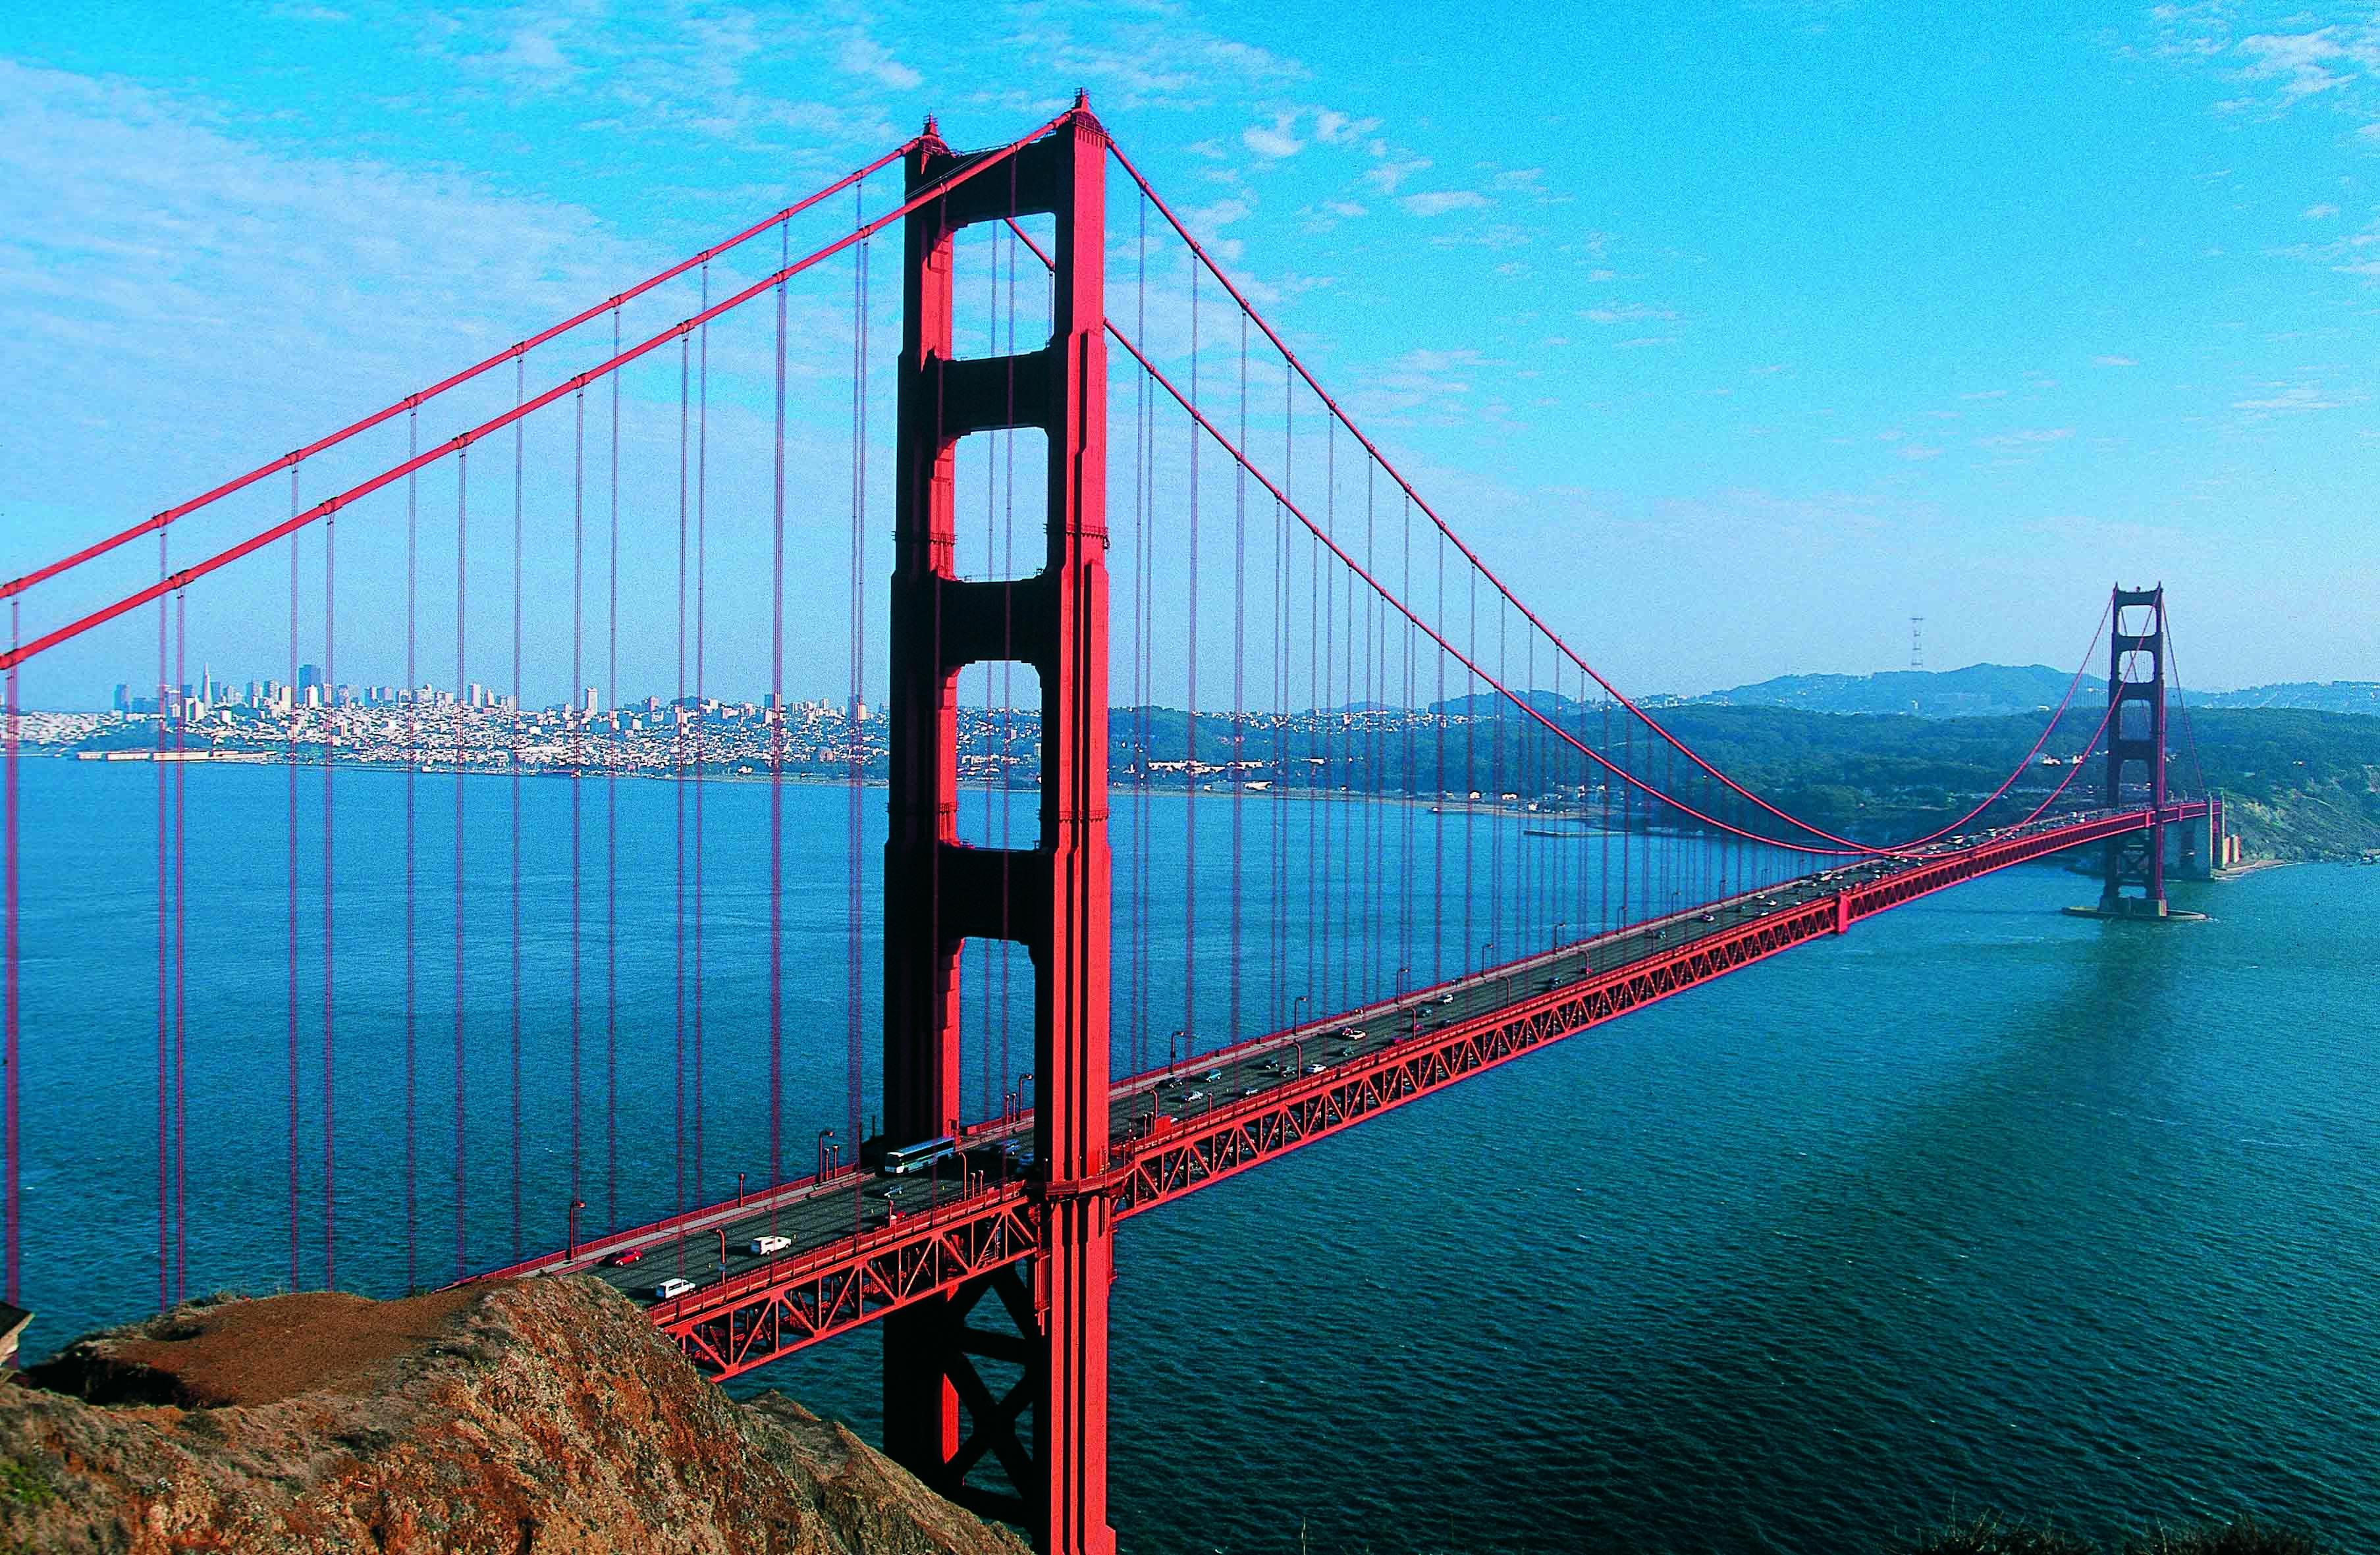 46 Golden Gate Bridge Wallpaper Hd On Wallpapersafari